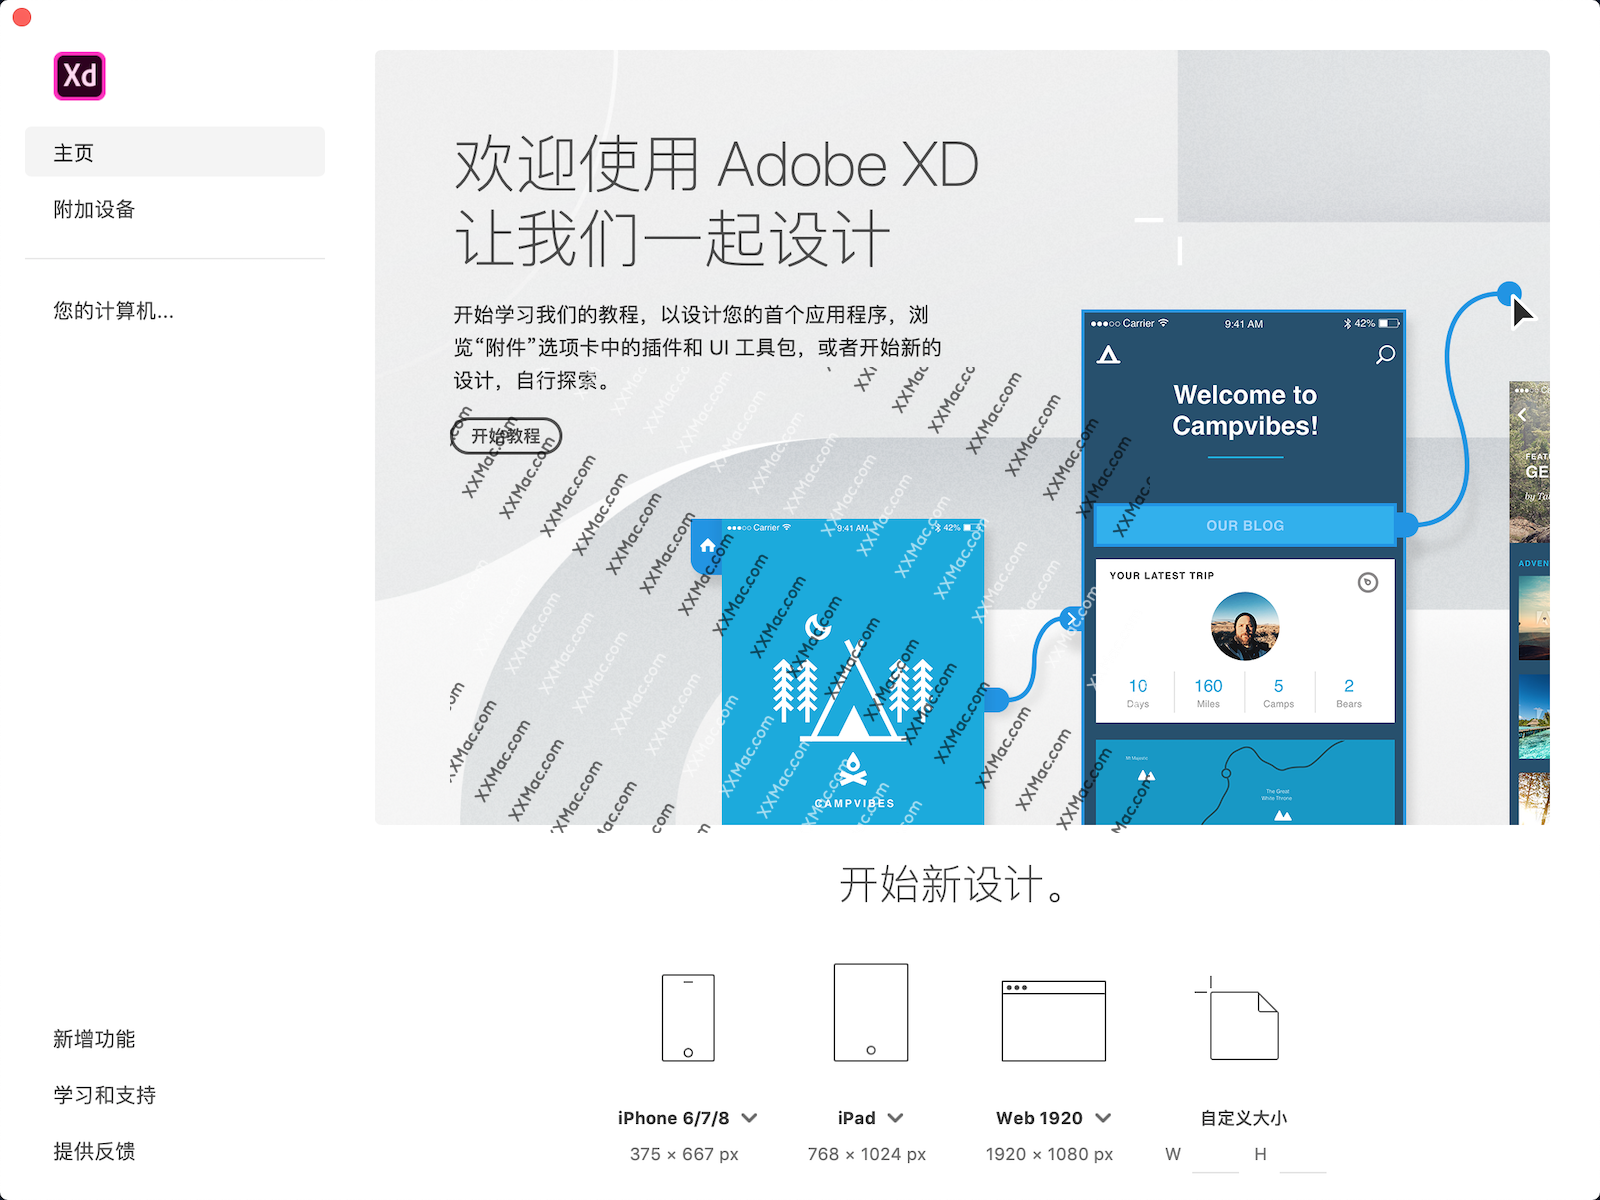 Adobe XD CC 2019 for Mac v18.1.12 中文破解版下载 原型设计软件